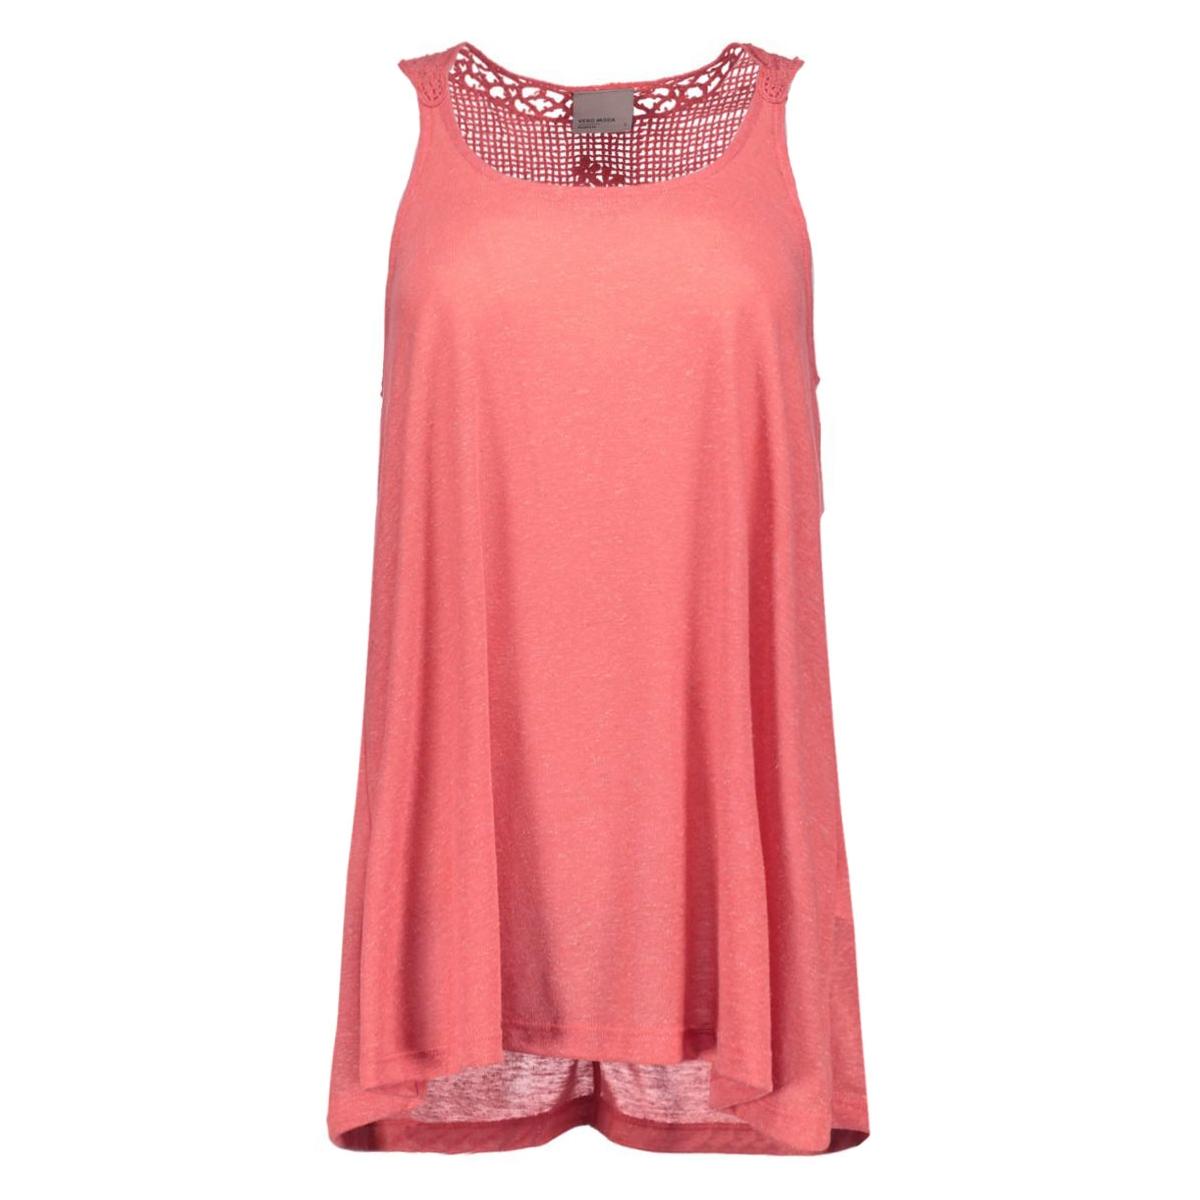 vmmolly s/l top 10157754 vero moda top rose of sharon/melange